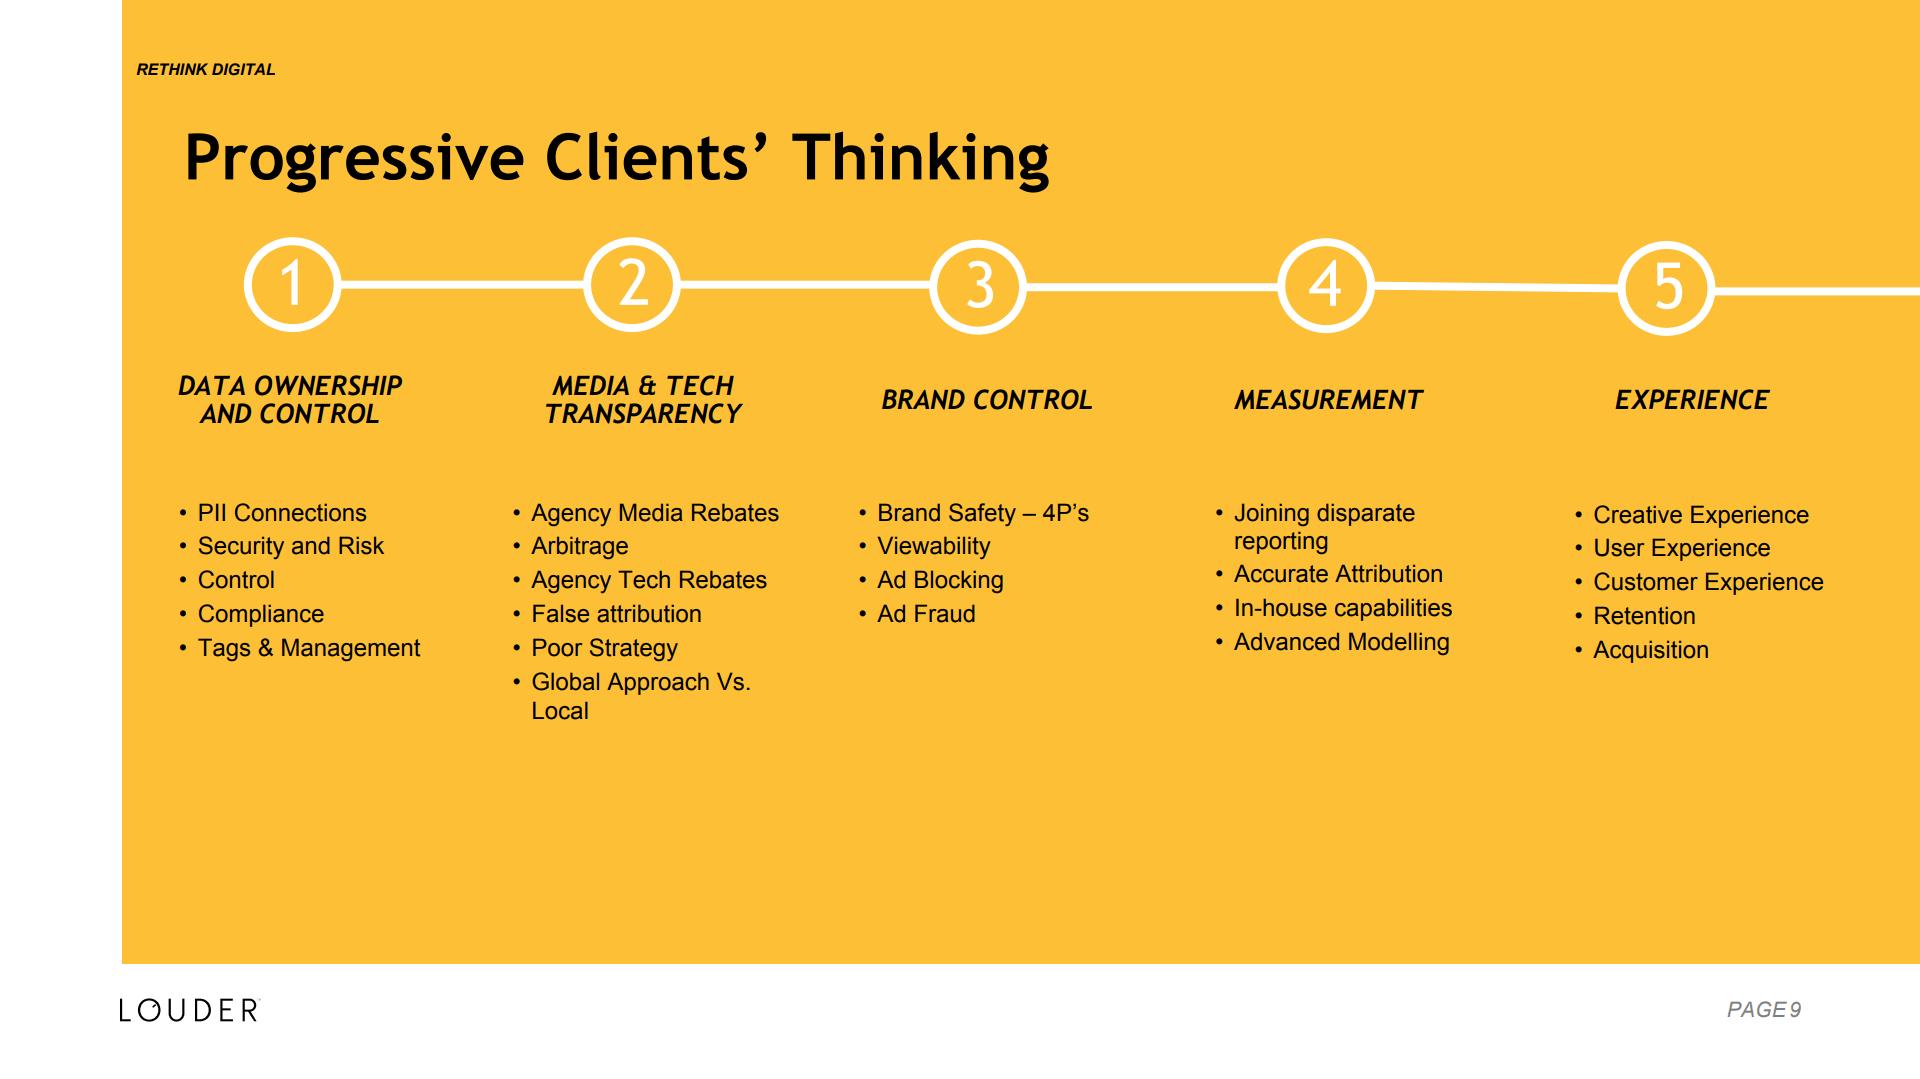 Progressive clients' thinking